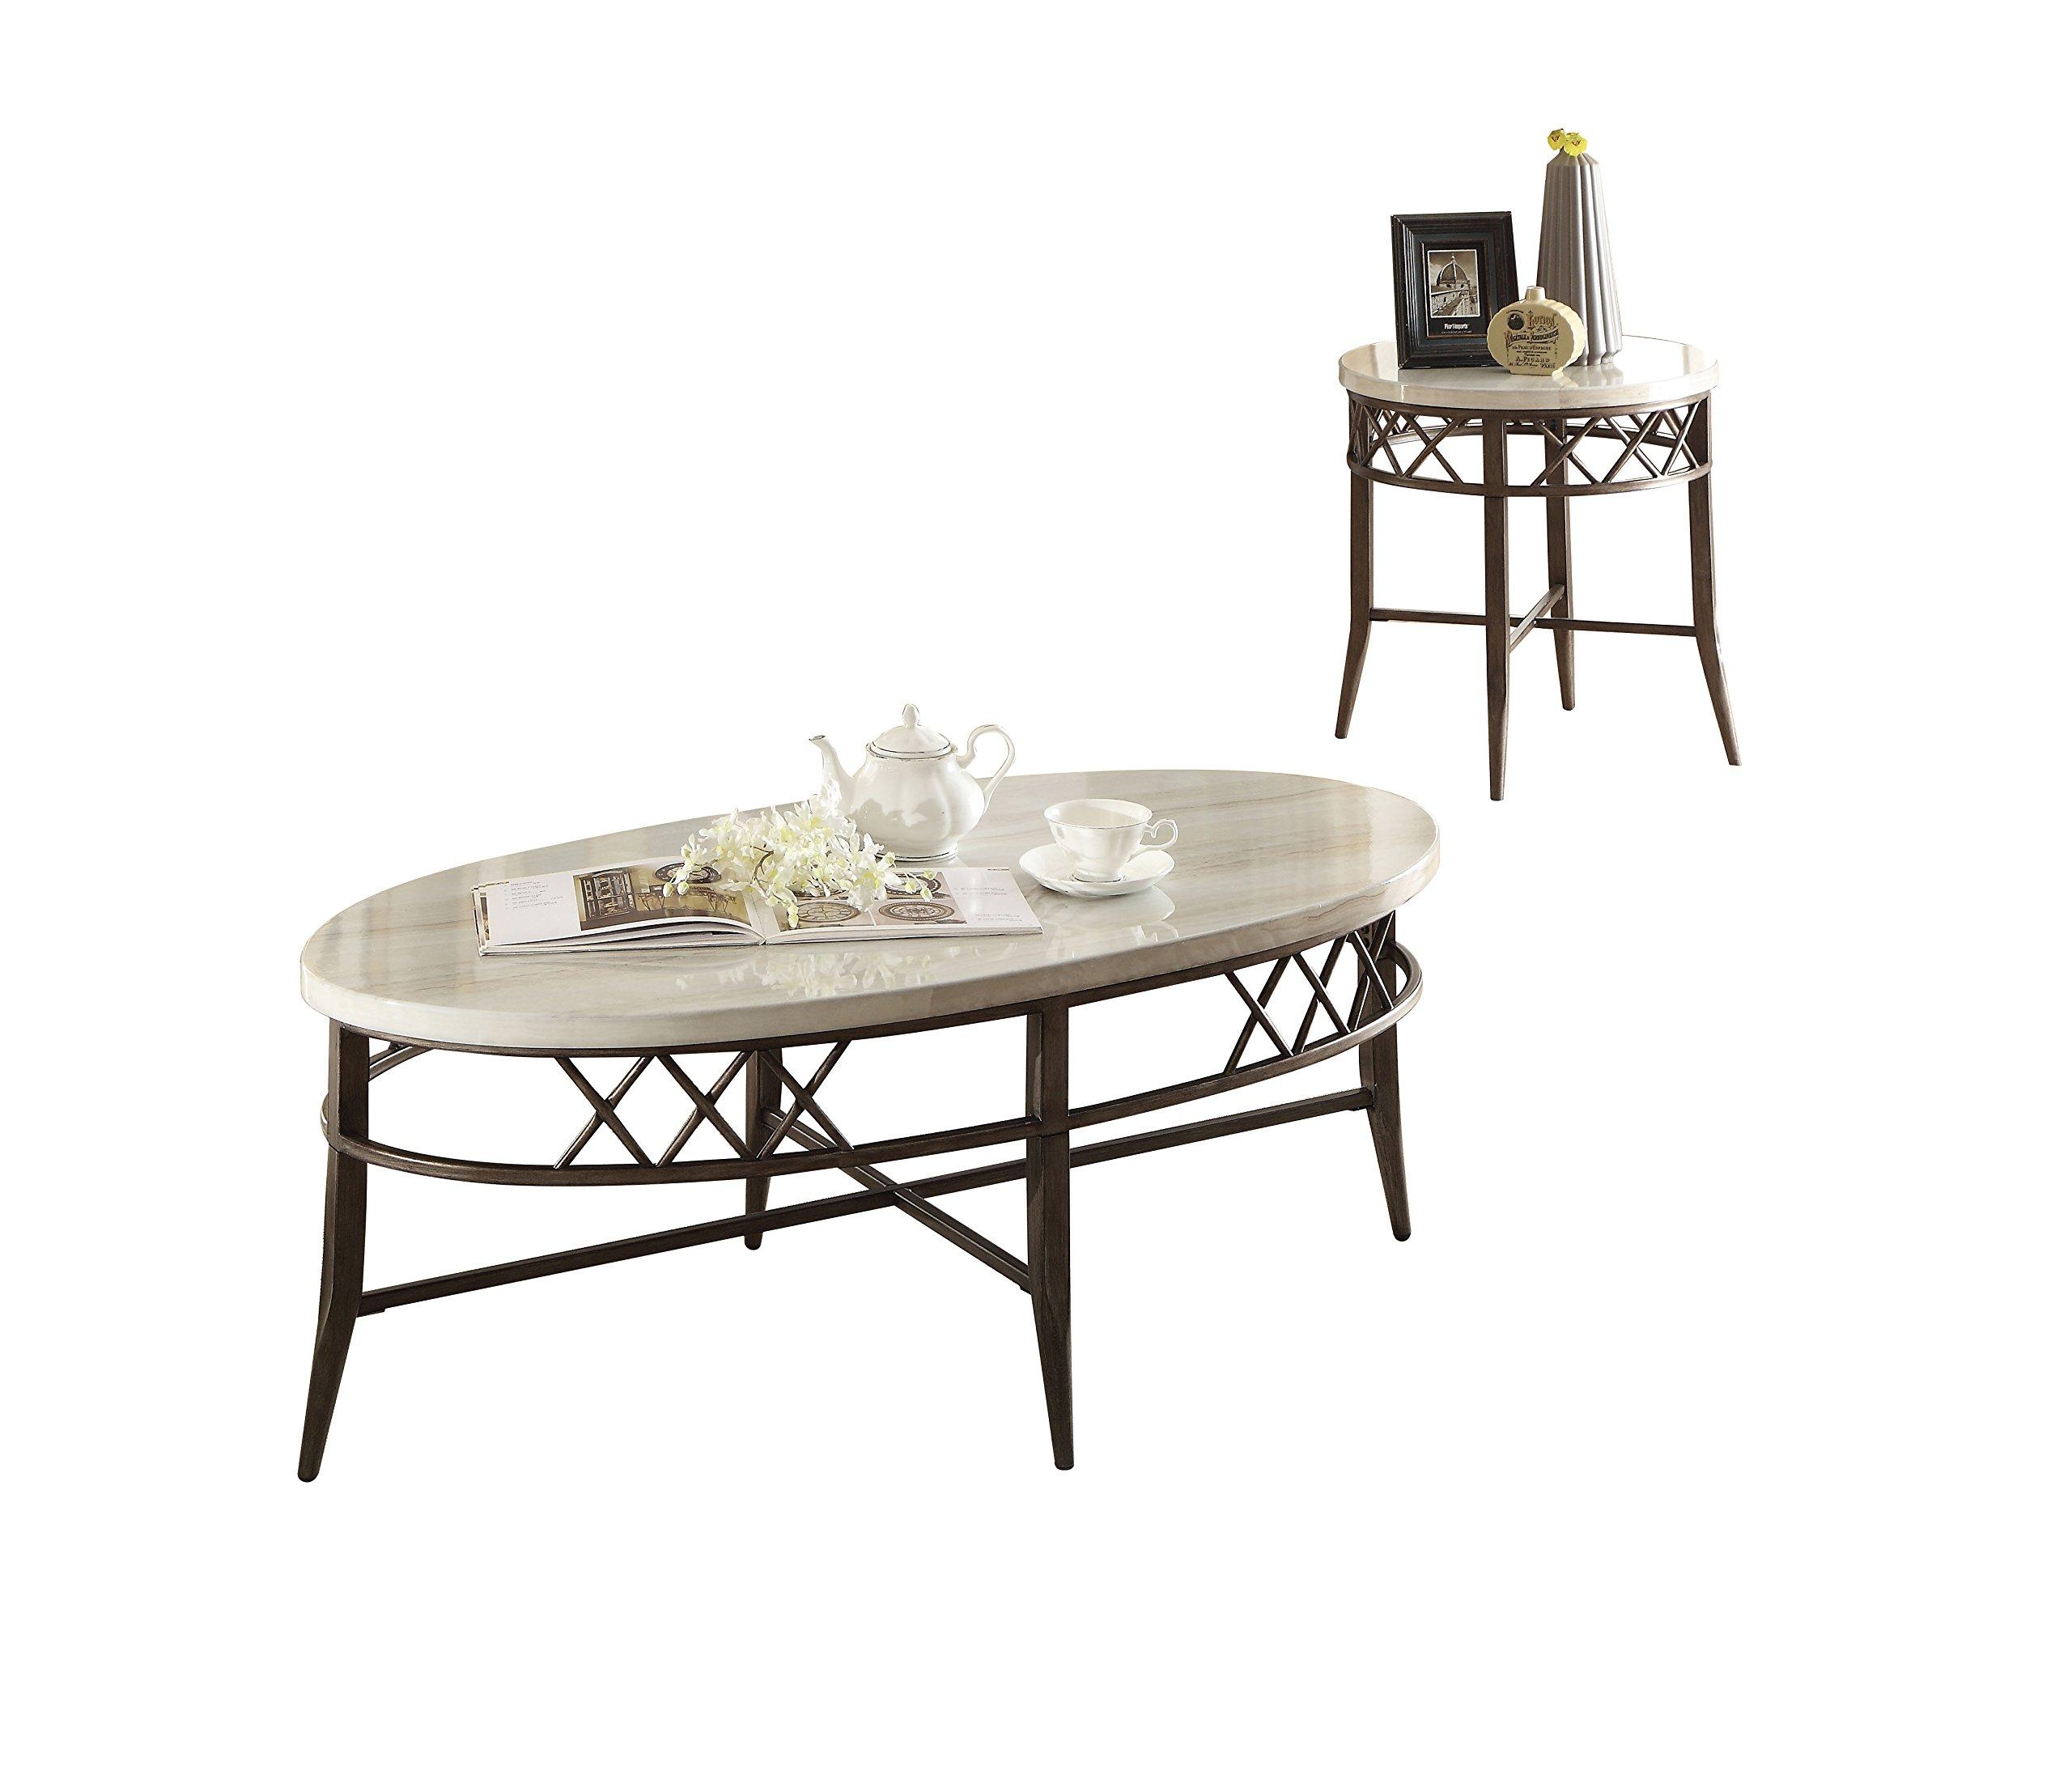 ACME Furniture 83100 Aldric 3 Piece Coffee End Set, Faux Marble